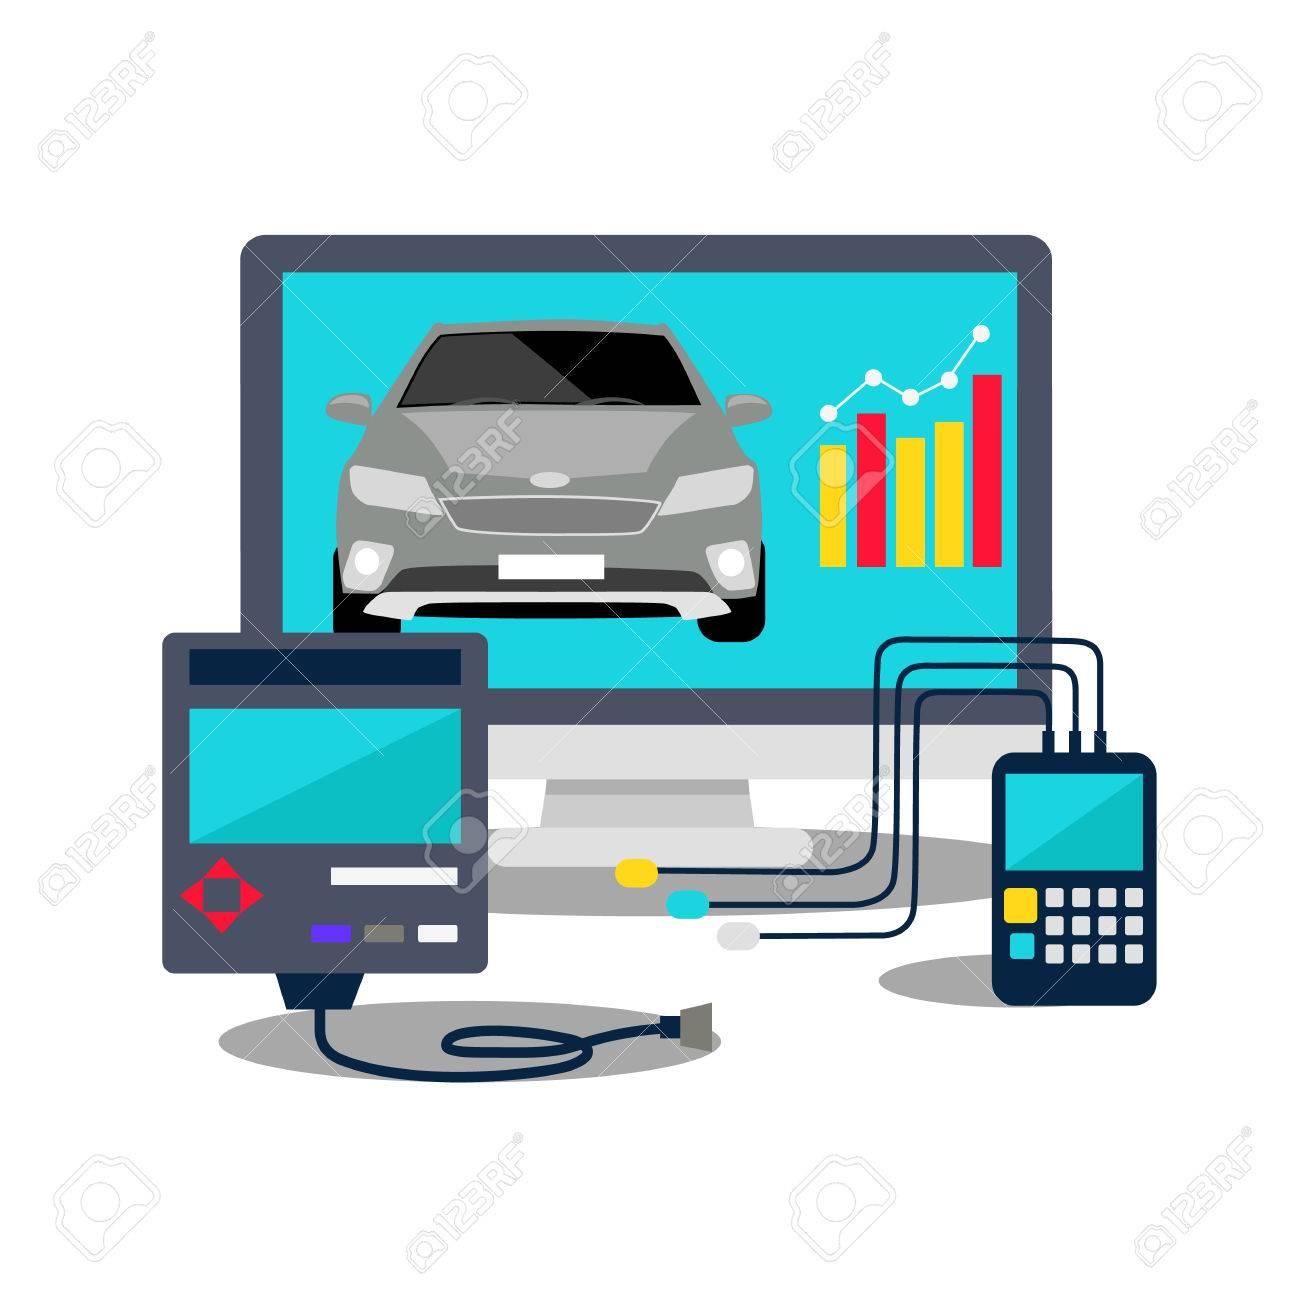 auto mechanic service flat icons of maintenance car repair. auto